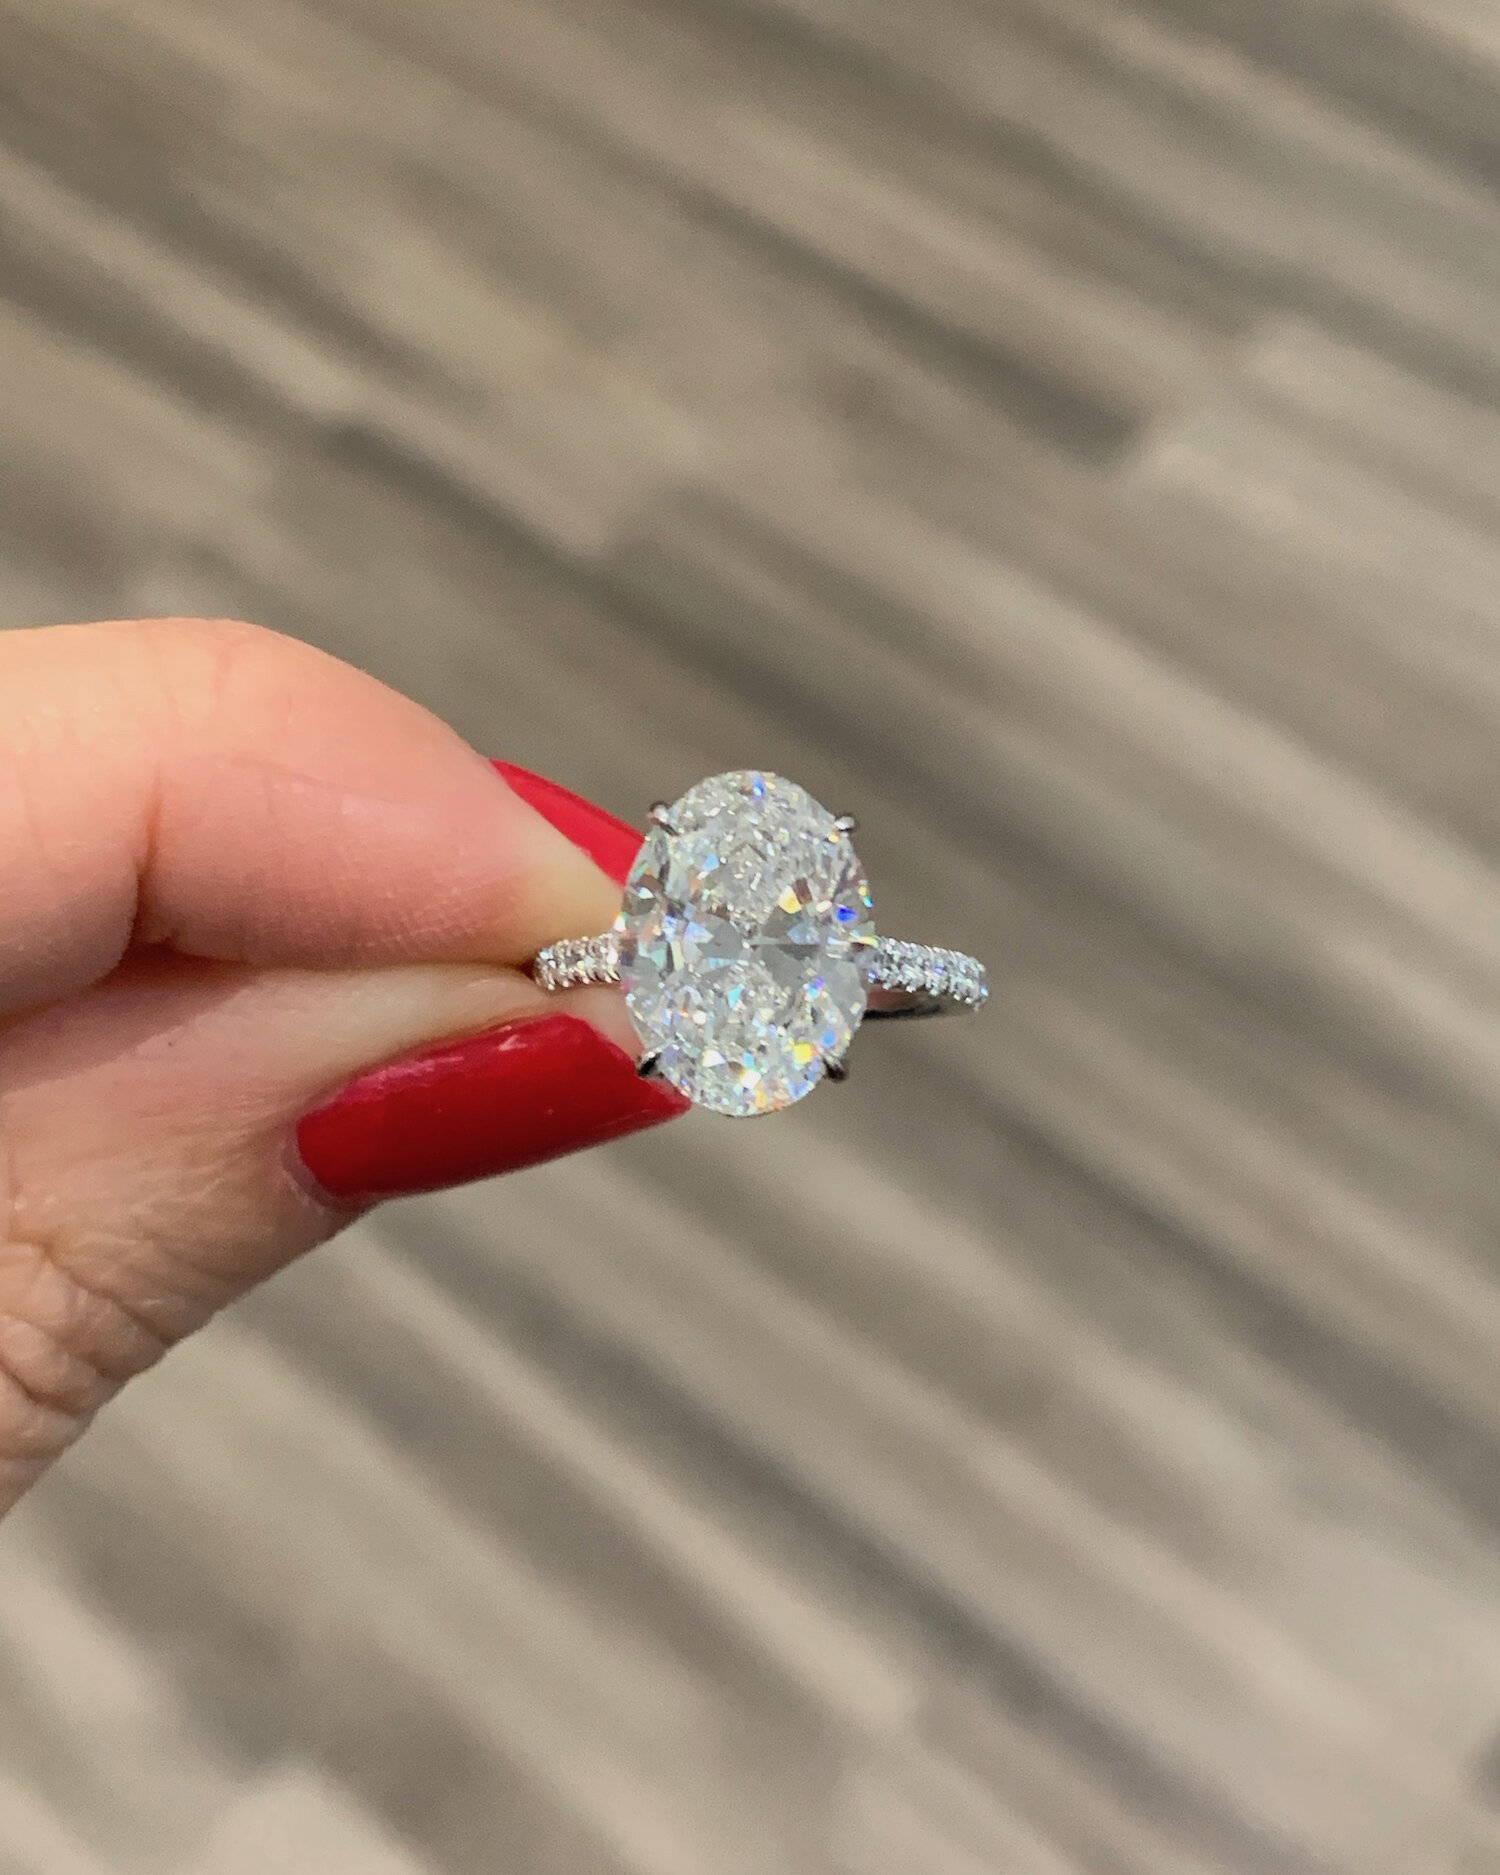 Miss Diamond Ring 3 Carat 4 Carat Oval Diamond Engagement Ring